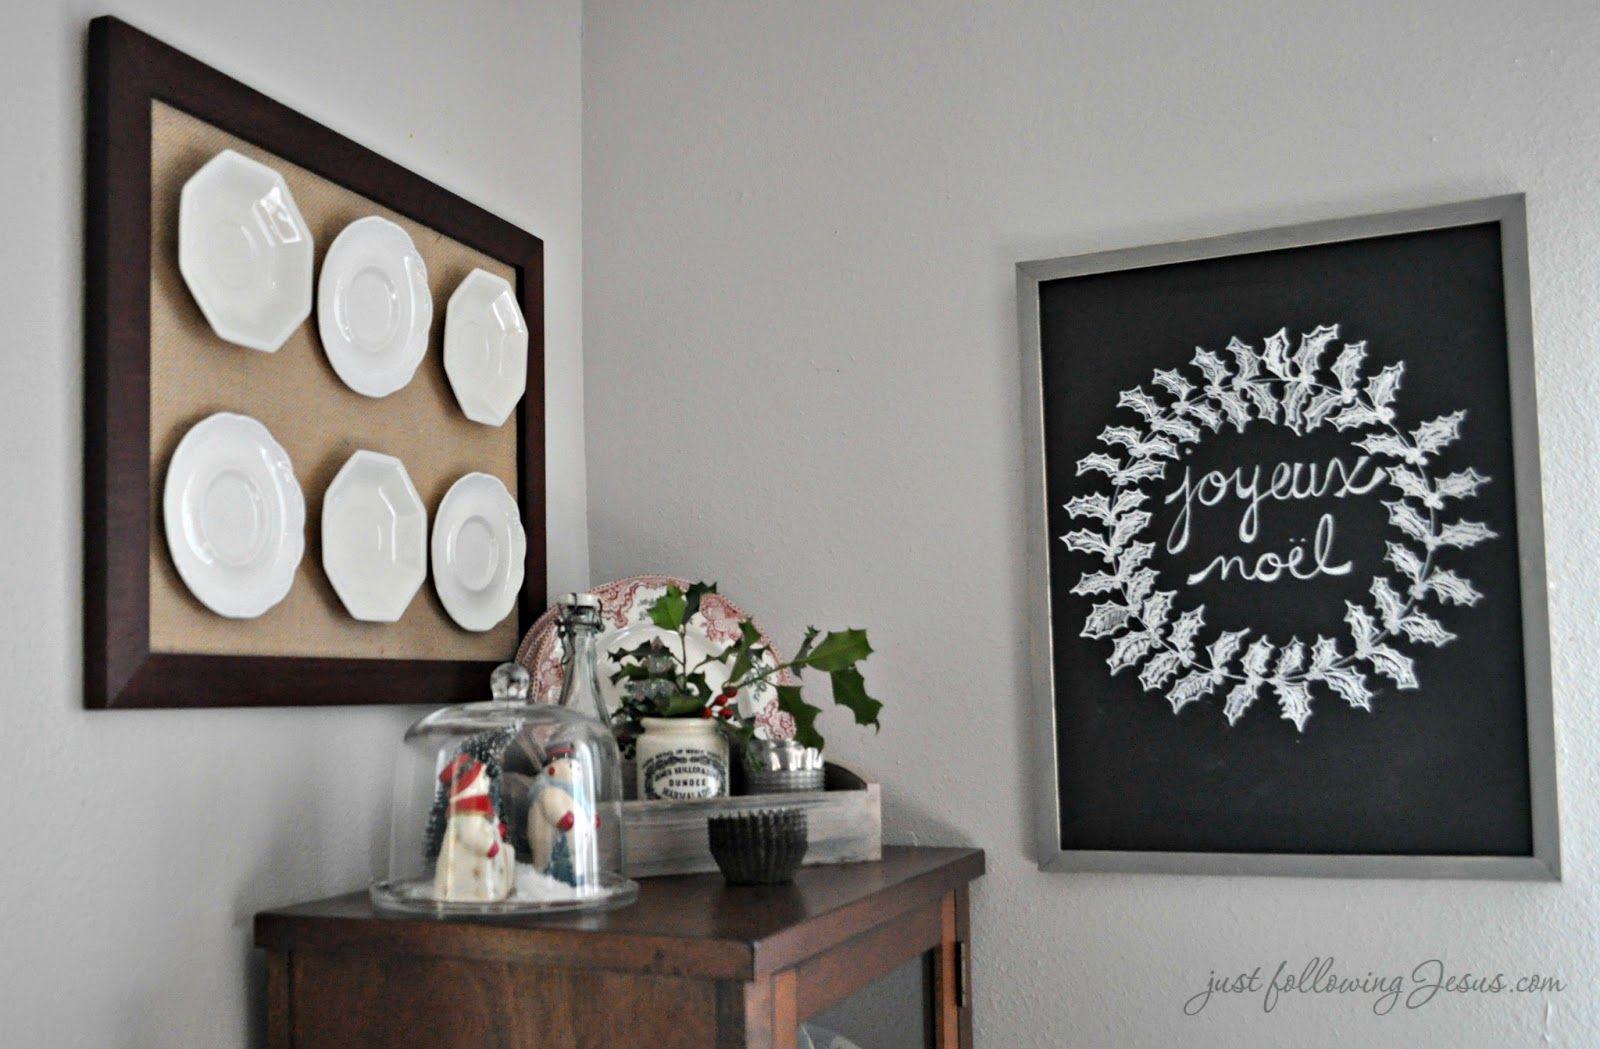 Home interior jesus just following jesus chalkboard  christmas ideas  pinterest